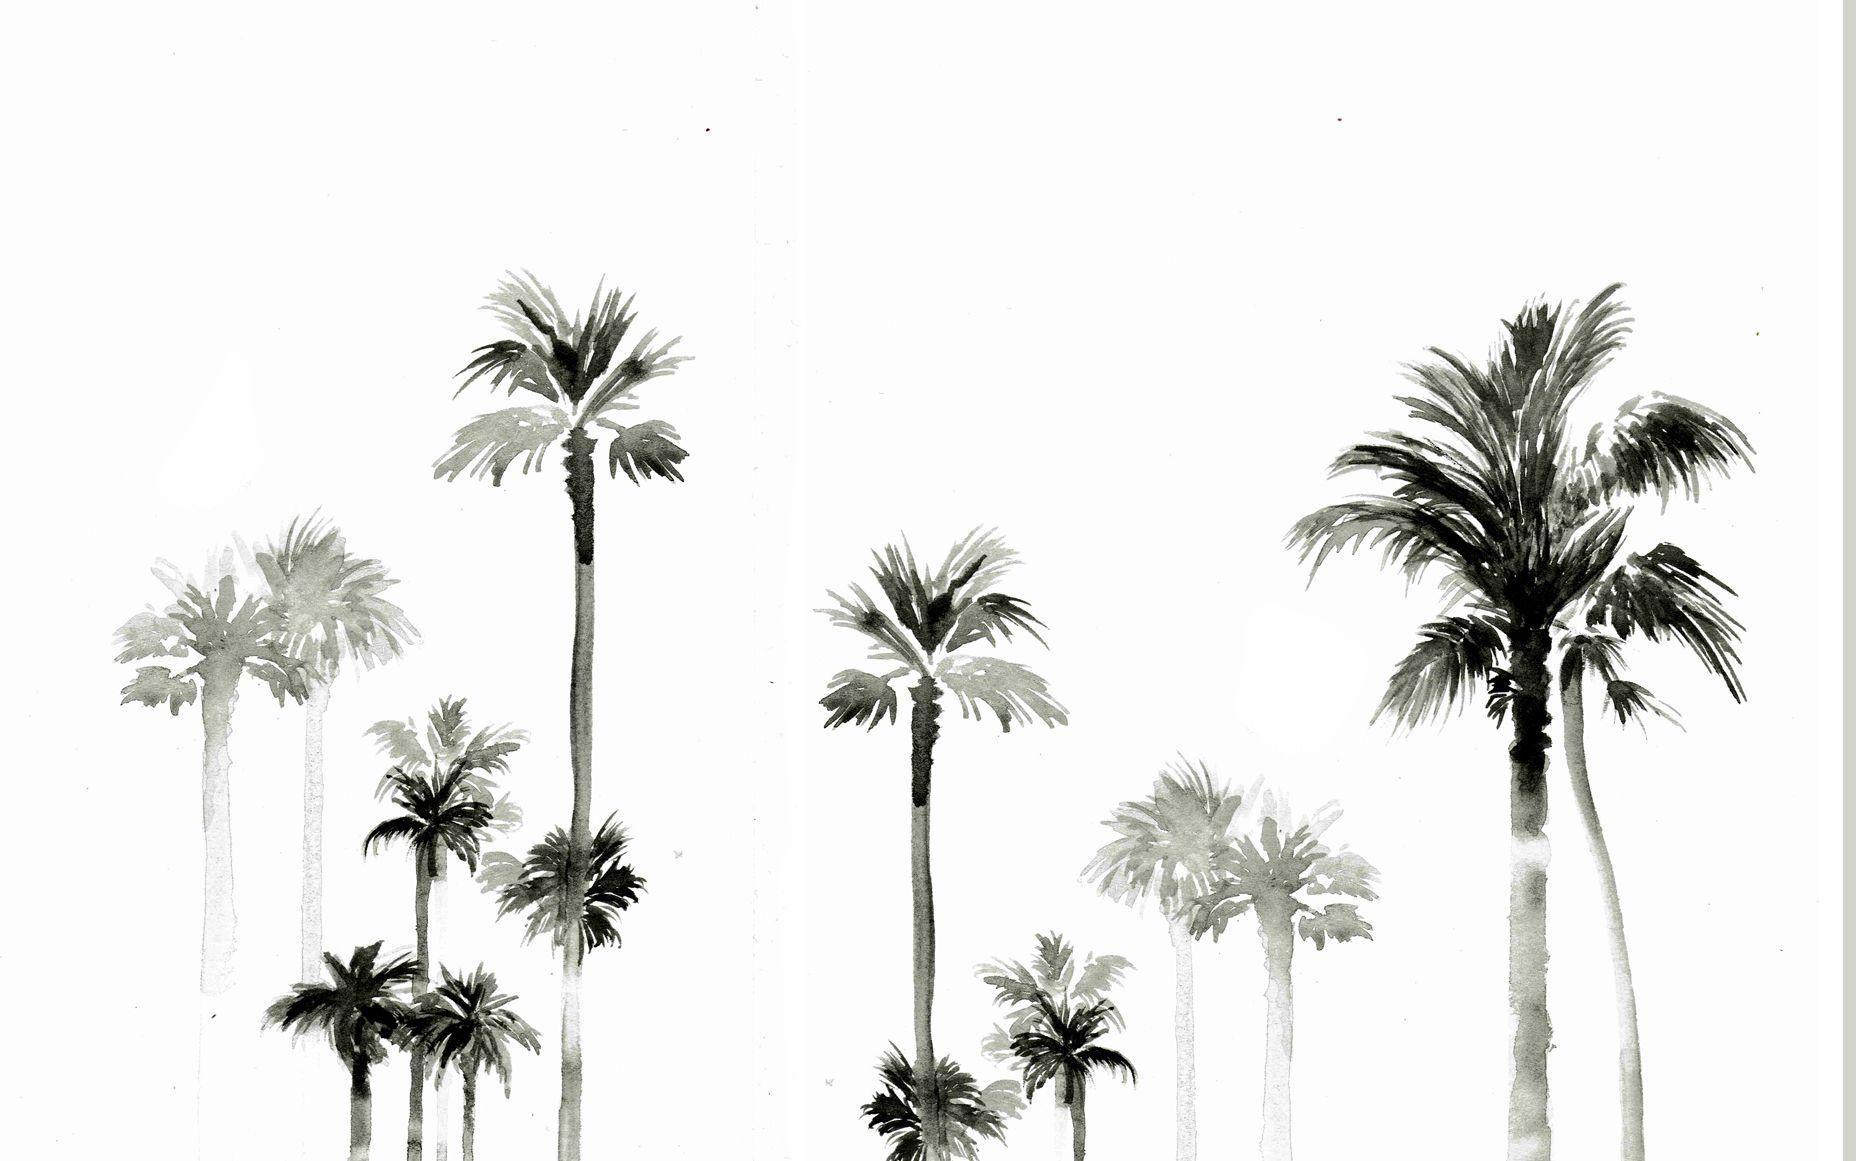 Maquiagem Para Noiva De 100 Inspiracoes Para Todos Tipos De Pele In 2020 Summer Wallpaper Palm Trees Wallpaper Tree Wallpaper